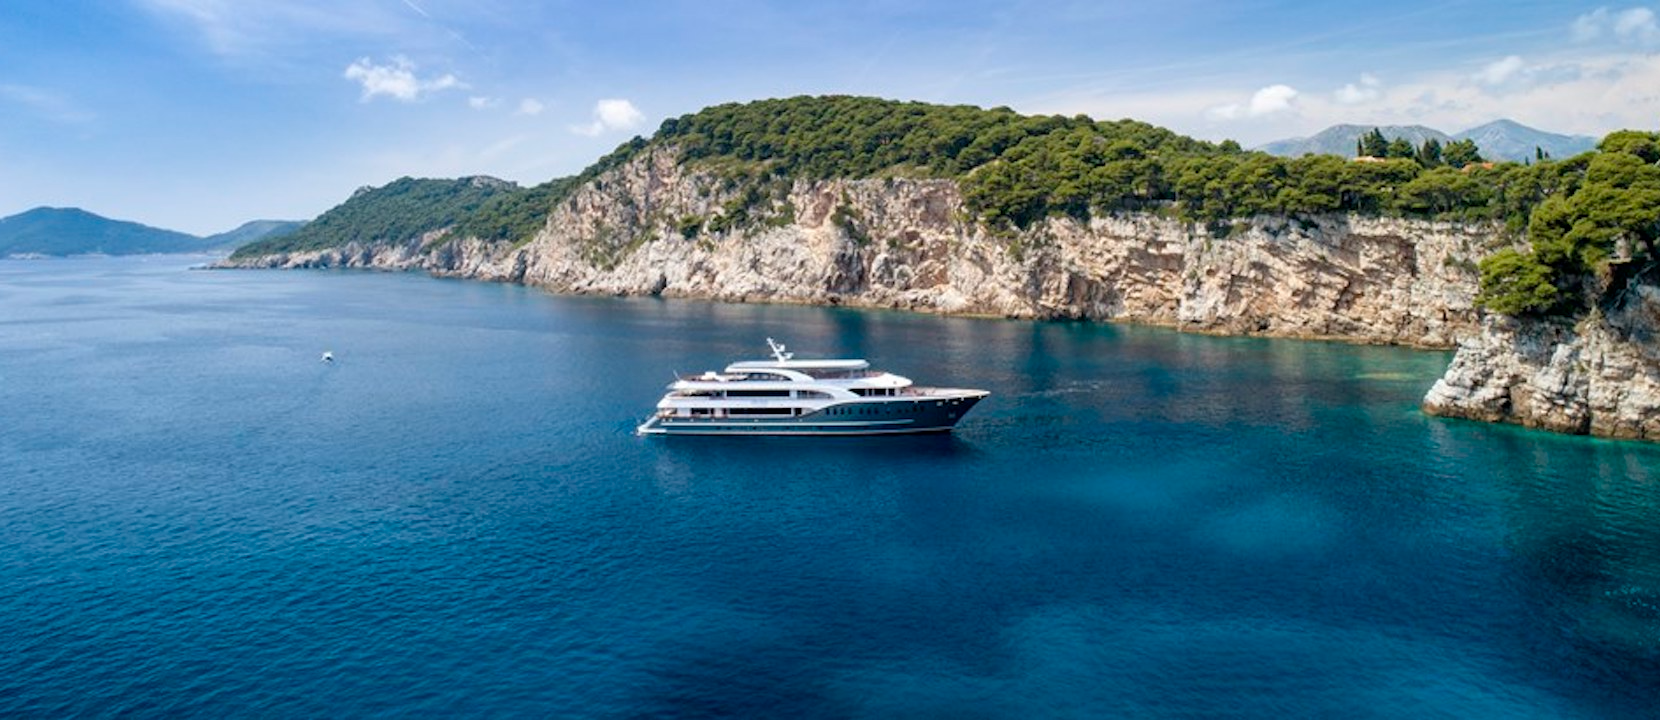 8 Day Adriatic Paradise Cruise by M/S Adriatic Princess